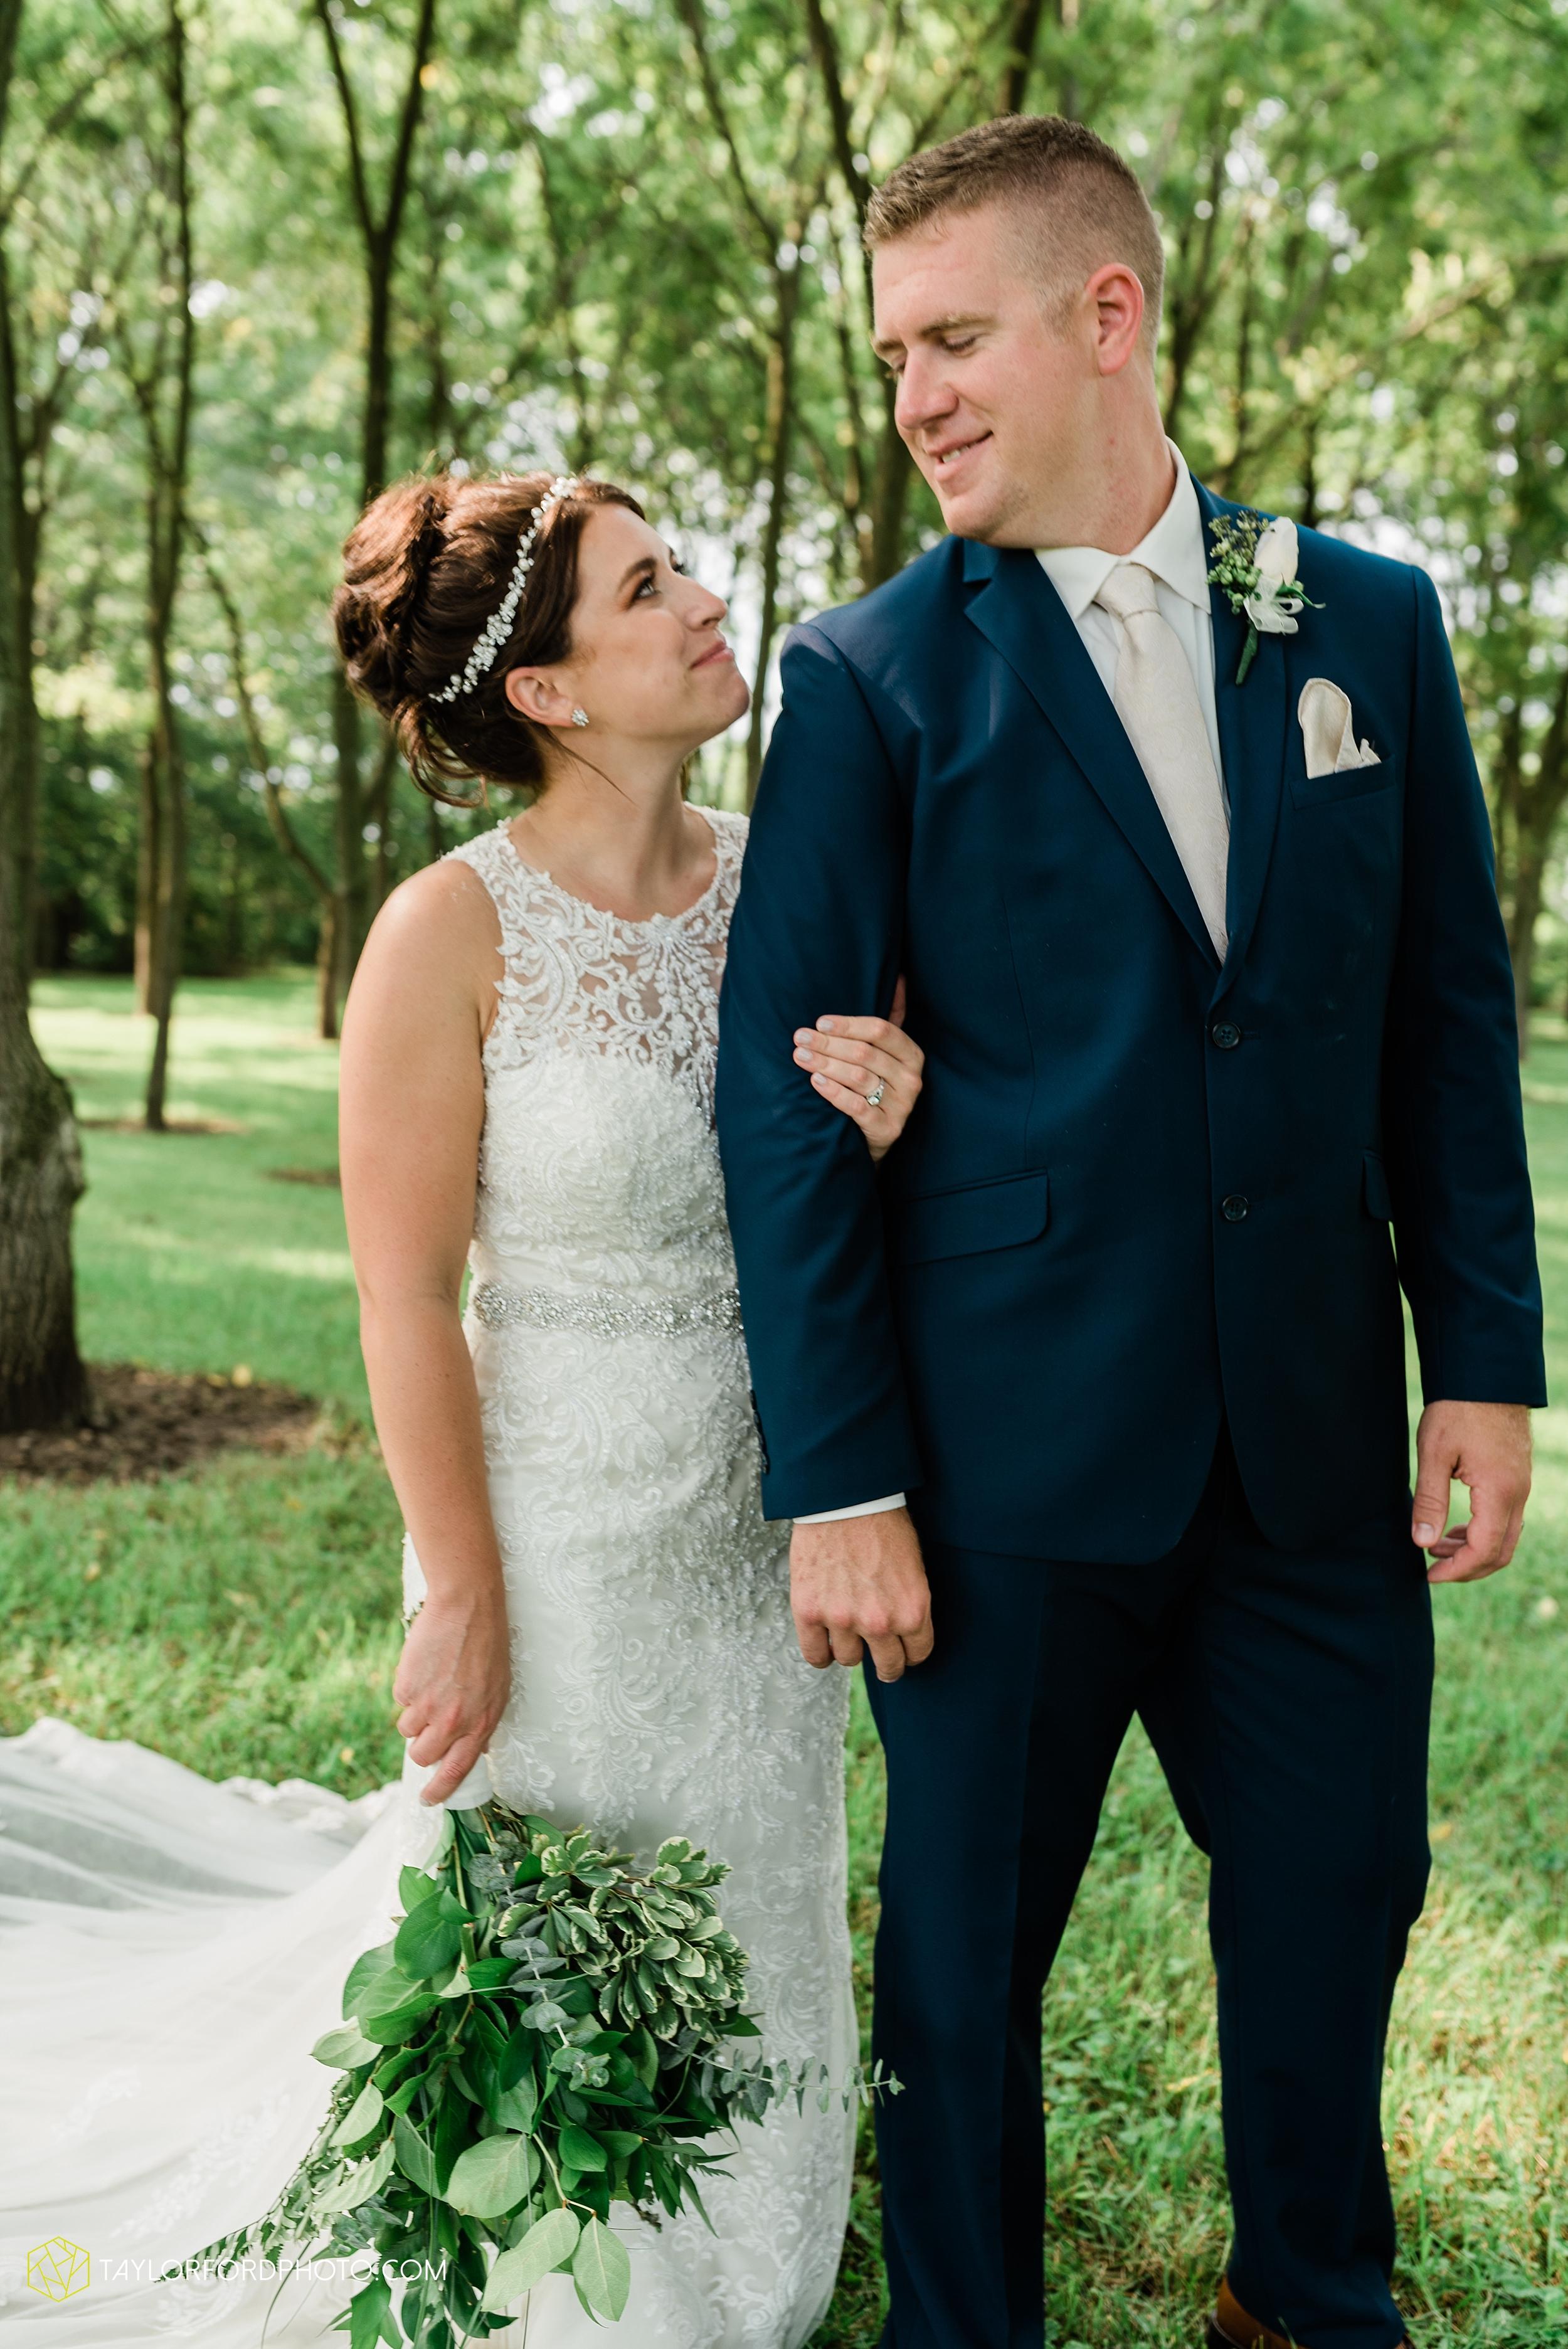 van-wert-ohio-first-united-methodist-church-county-dairy-barn-wedding-photographer-taylor-ford-photography_9857.jpg